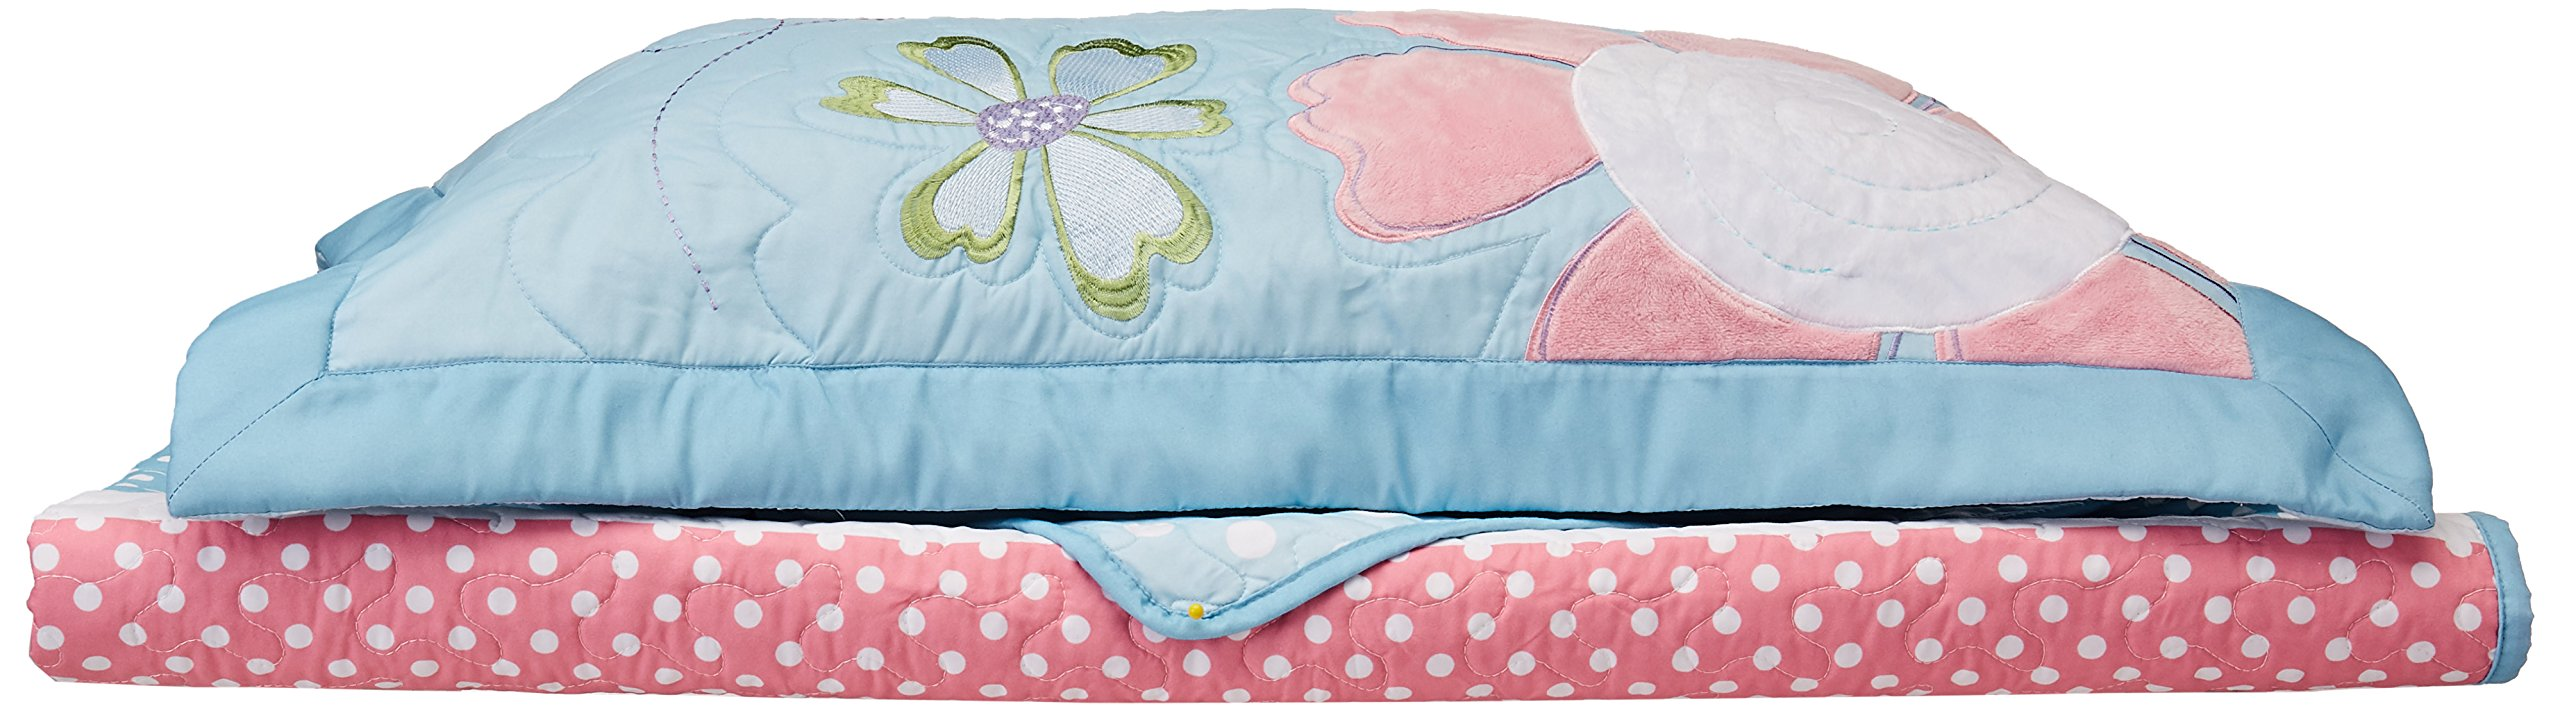 Mi Zone Kids Crazy Daisy Twin Bedding For Girls Quilt Set - Sky Blue, Pink , Flowers, Butterfly – 3 Piece Kids Girls Quilts – Ultra Soft Microfiber Quilt Sets Coverlet